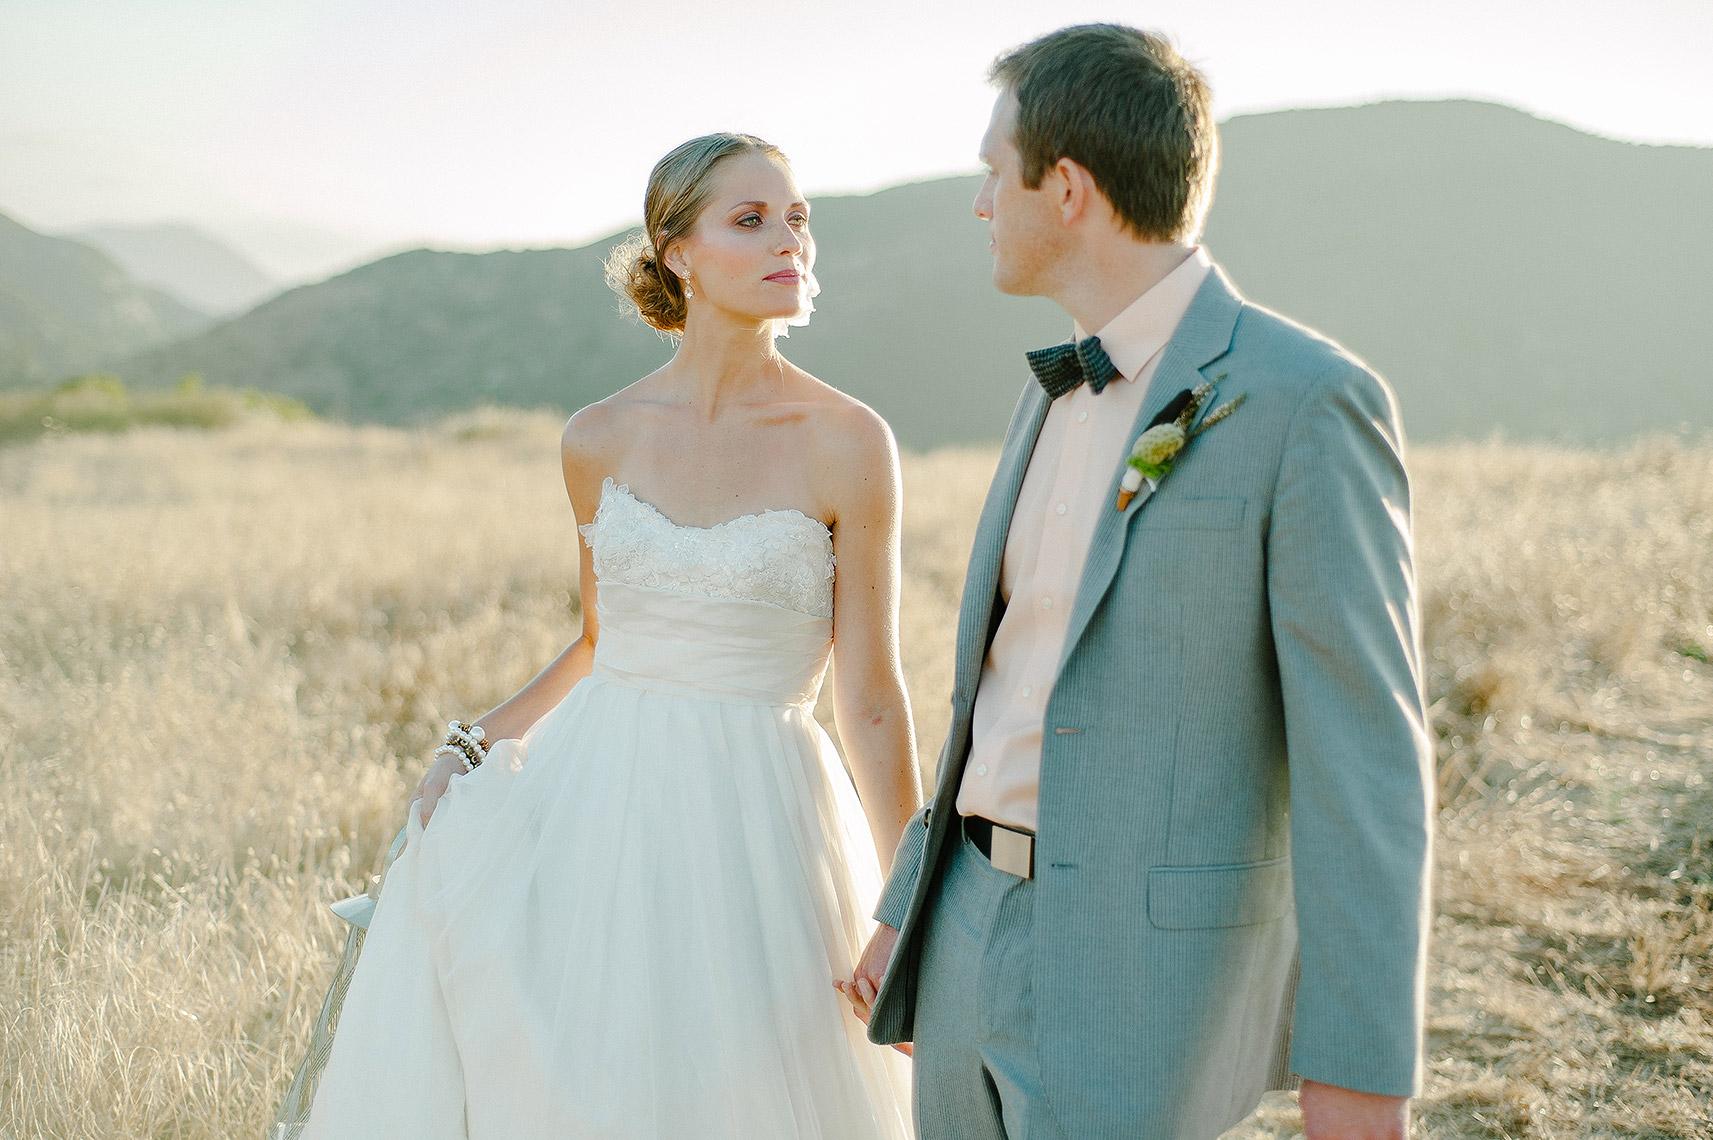 john-schnack-photography-san-diego-wedding-inspiration-shoot-back-country-vintage-wedding-26.jpg